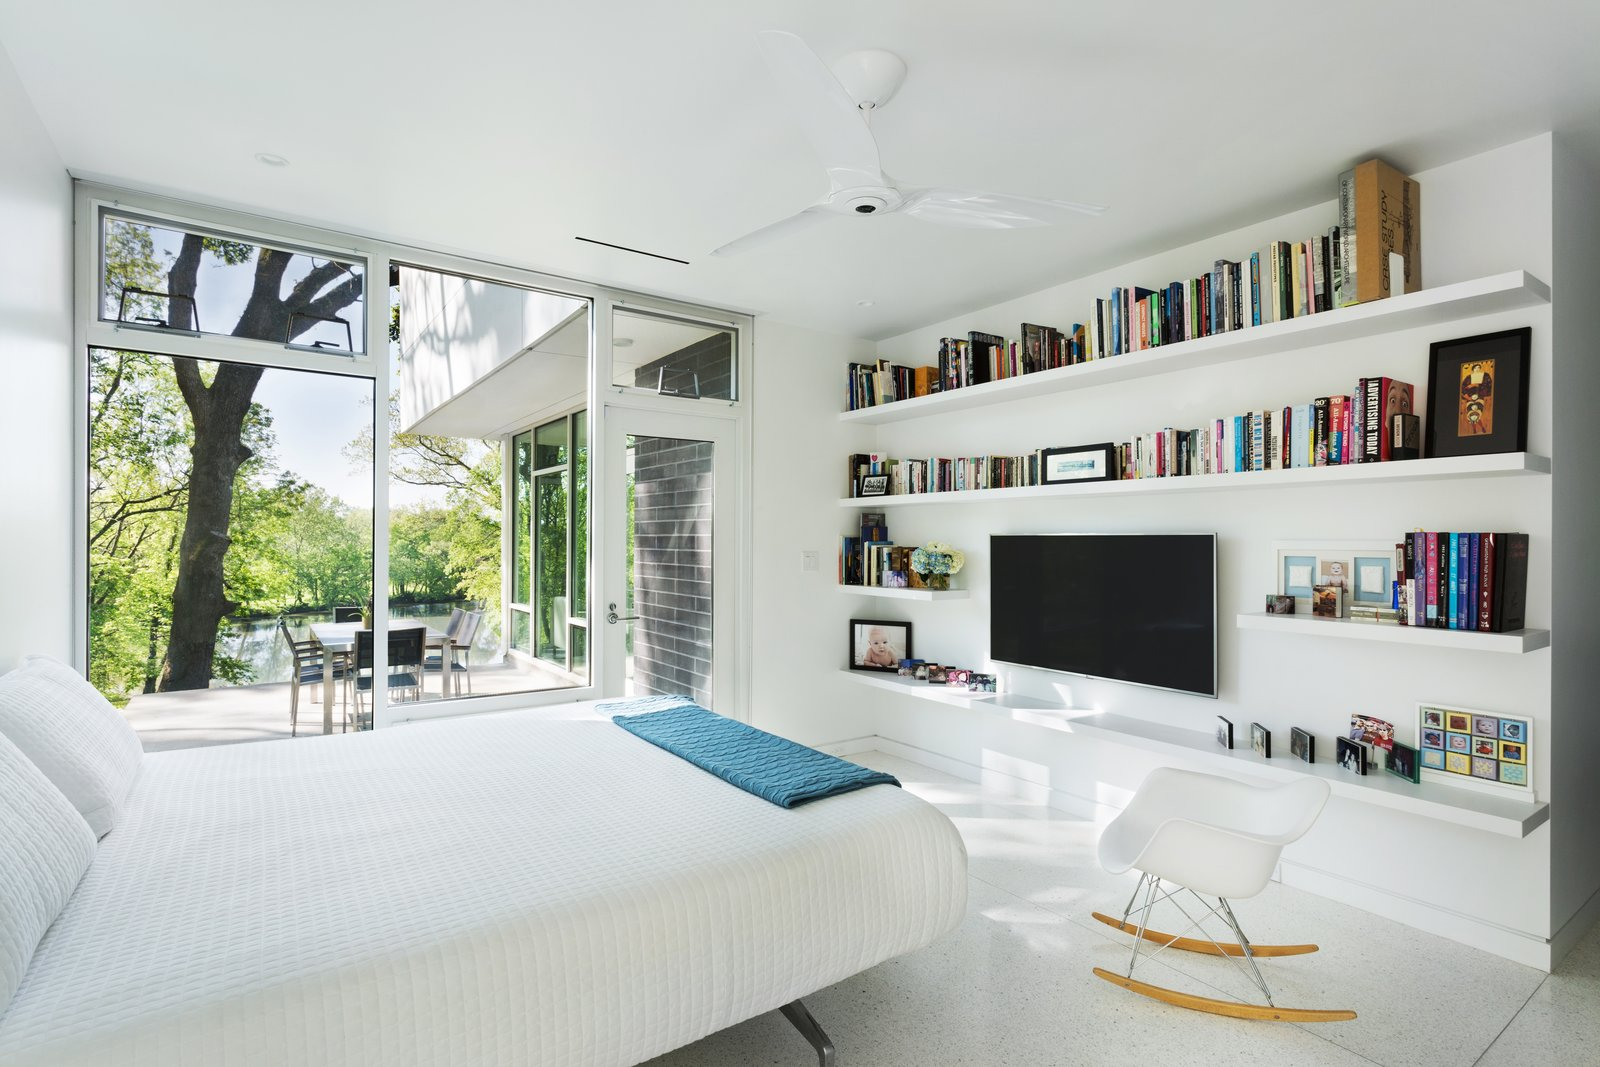 Master bedroom  Boetger Residence by Chad Boetger